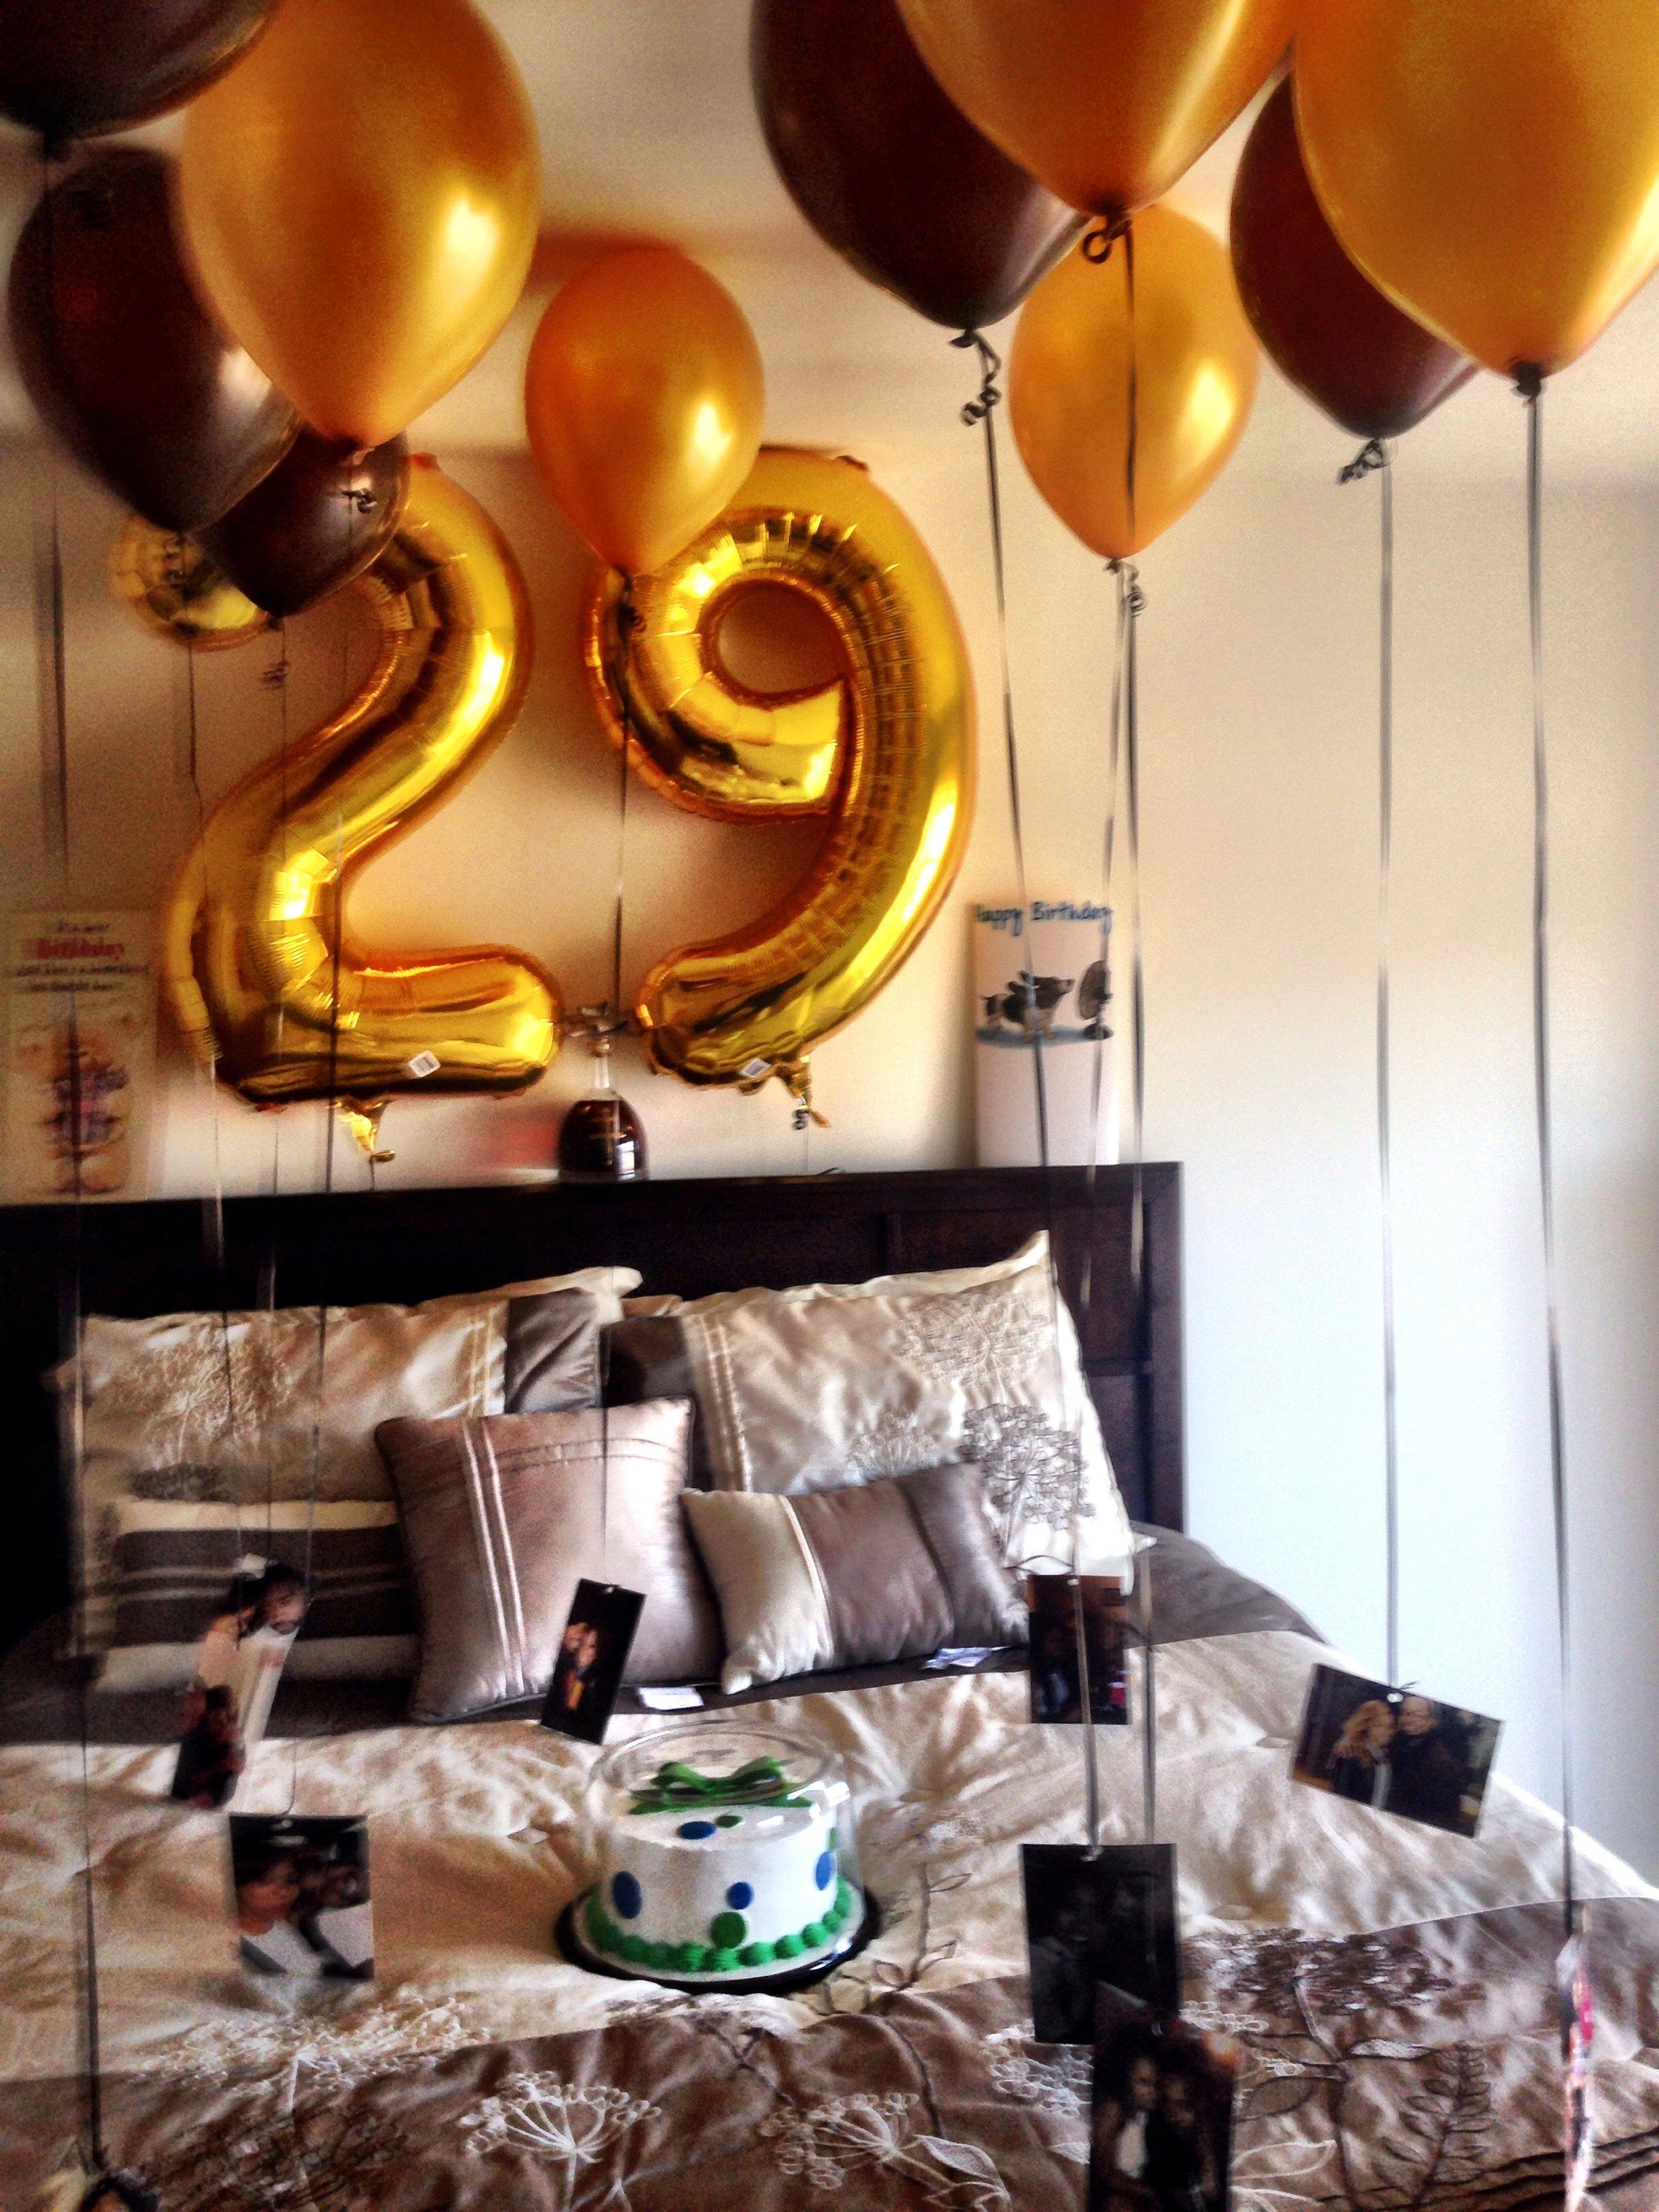 10 Fantastic Special Birthday Ideas For Him boyfriends birthday birthdays pinterest boyfriends birthdays 3 2021